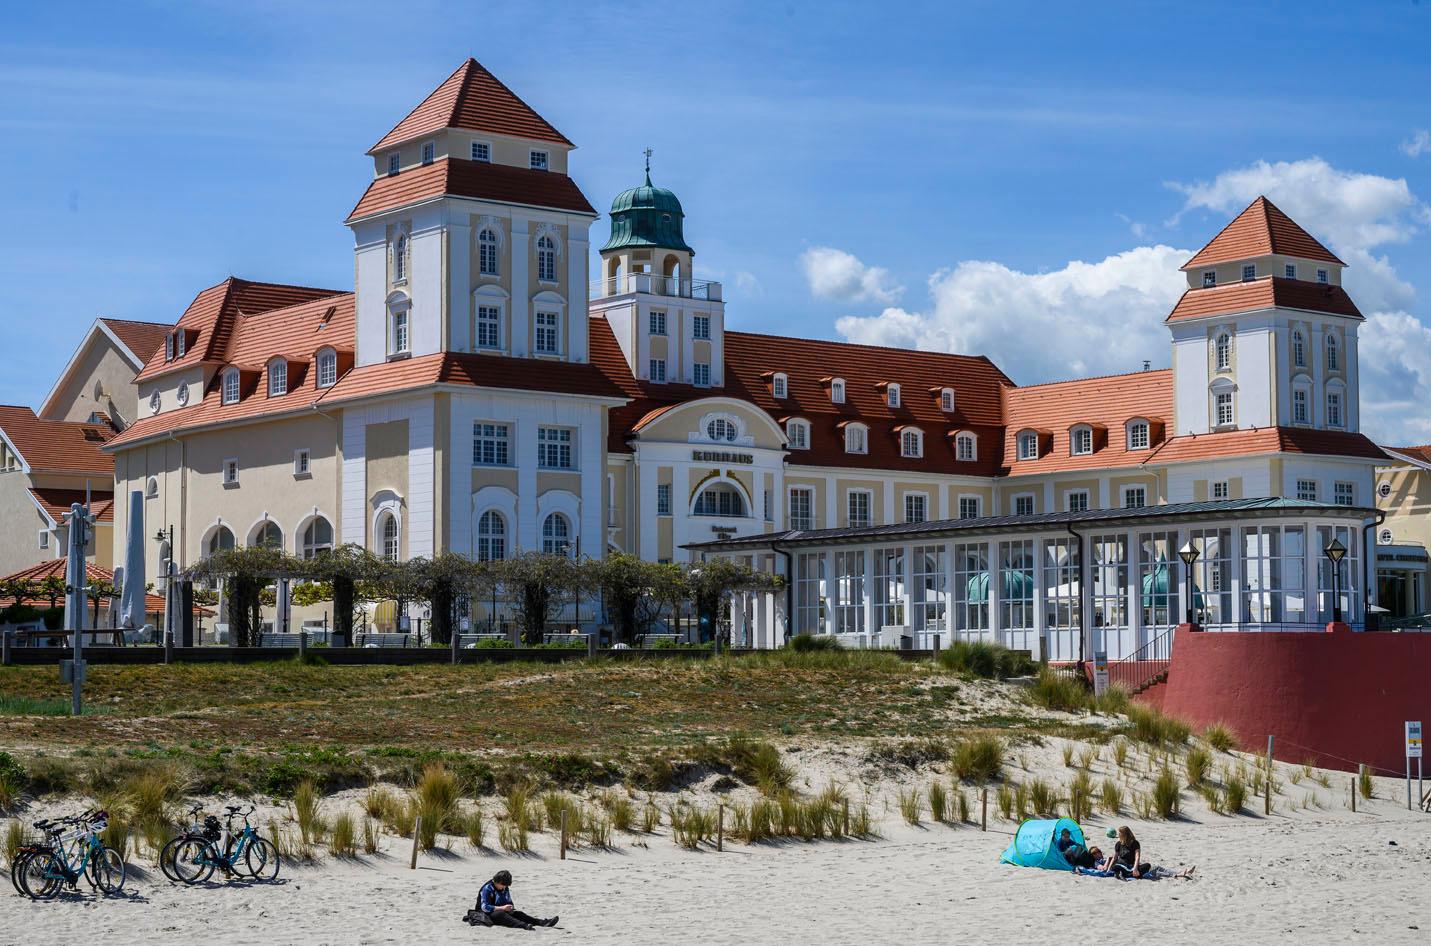 Le Travel Charme Kurhaus Hotel à Binz, AFP